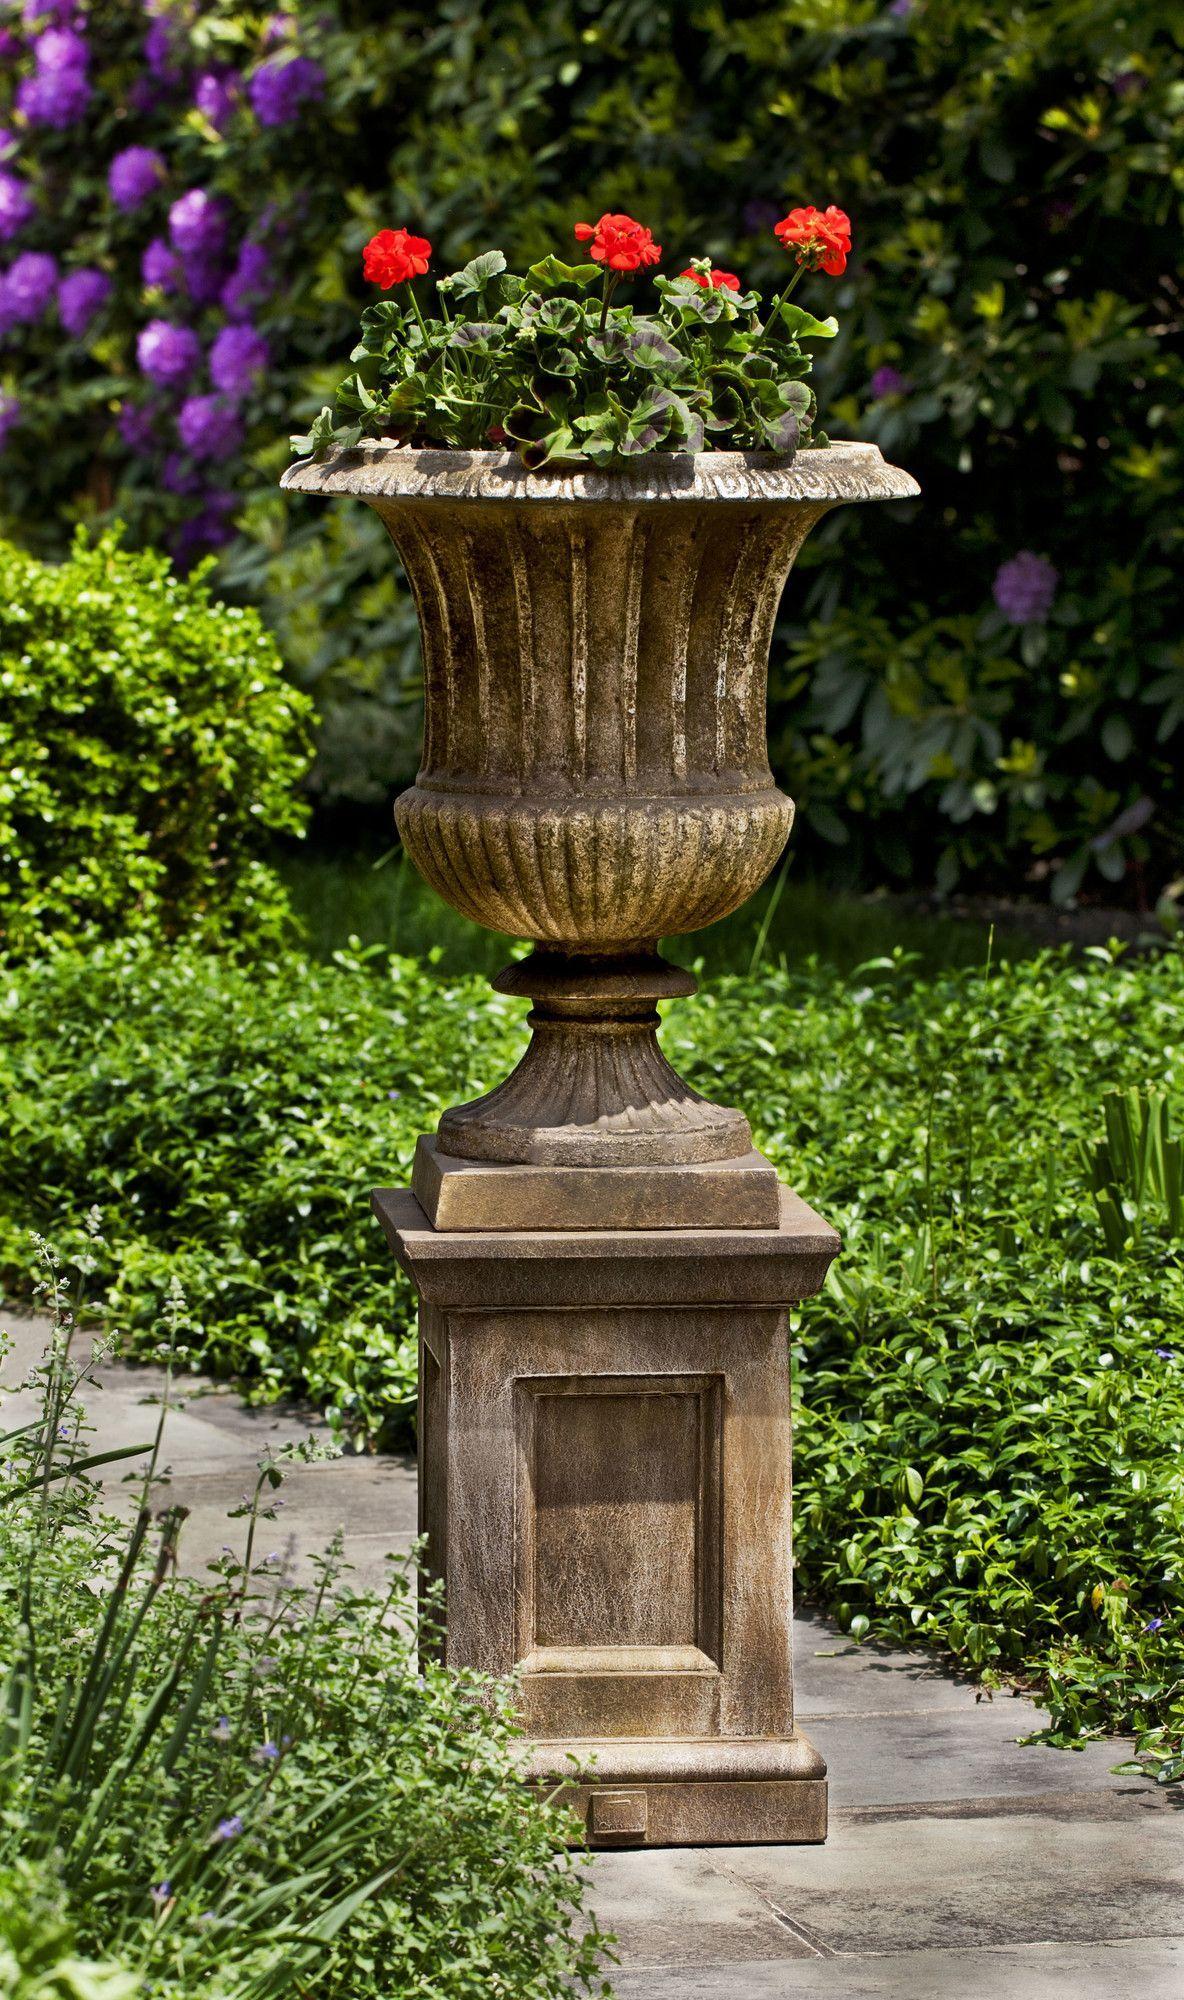 Smithsonian Novelty Pedestal Planter Urn Planters Outdoor Urns Planters